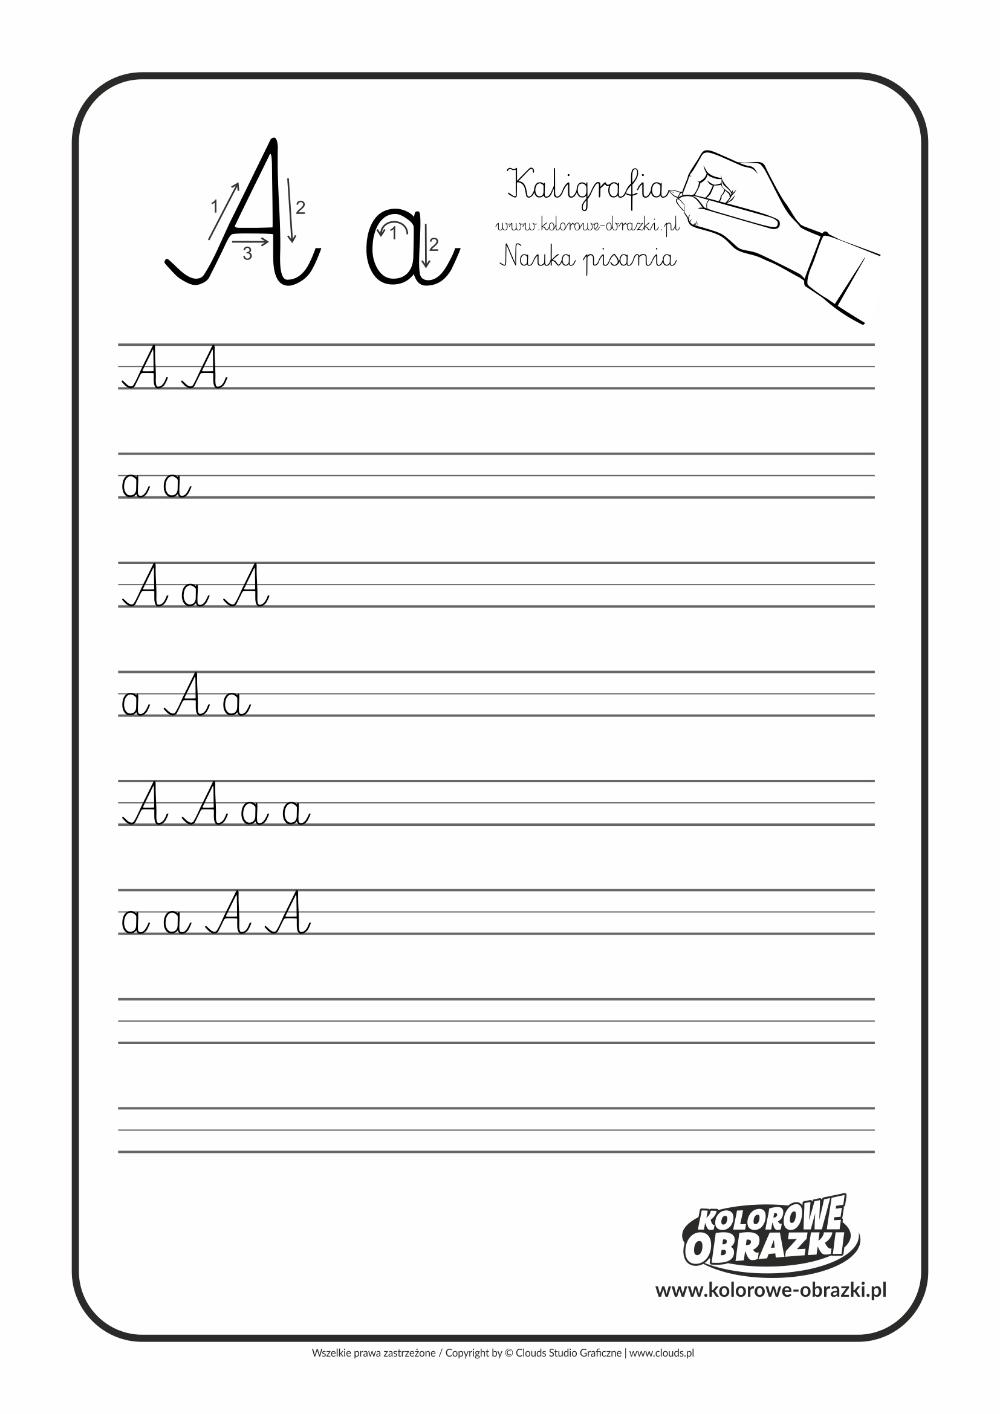 Litera A Kaligrafia Litery Kolorowanki Dla Dzieci Letters For Kids Calligraphy For Kids Cool Coloring Pages